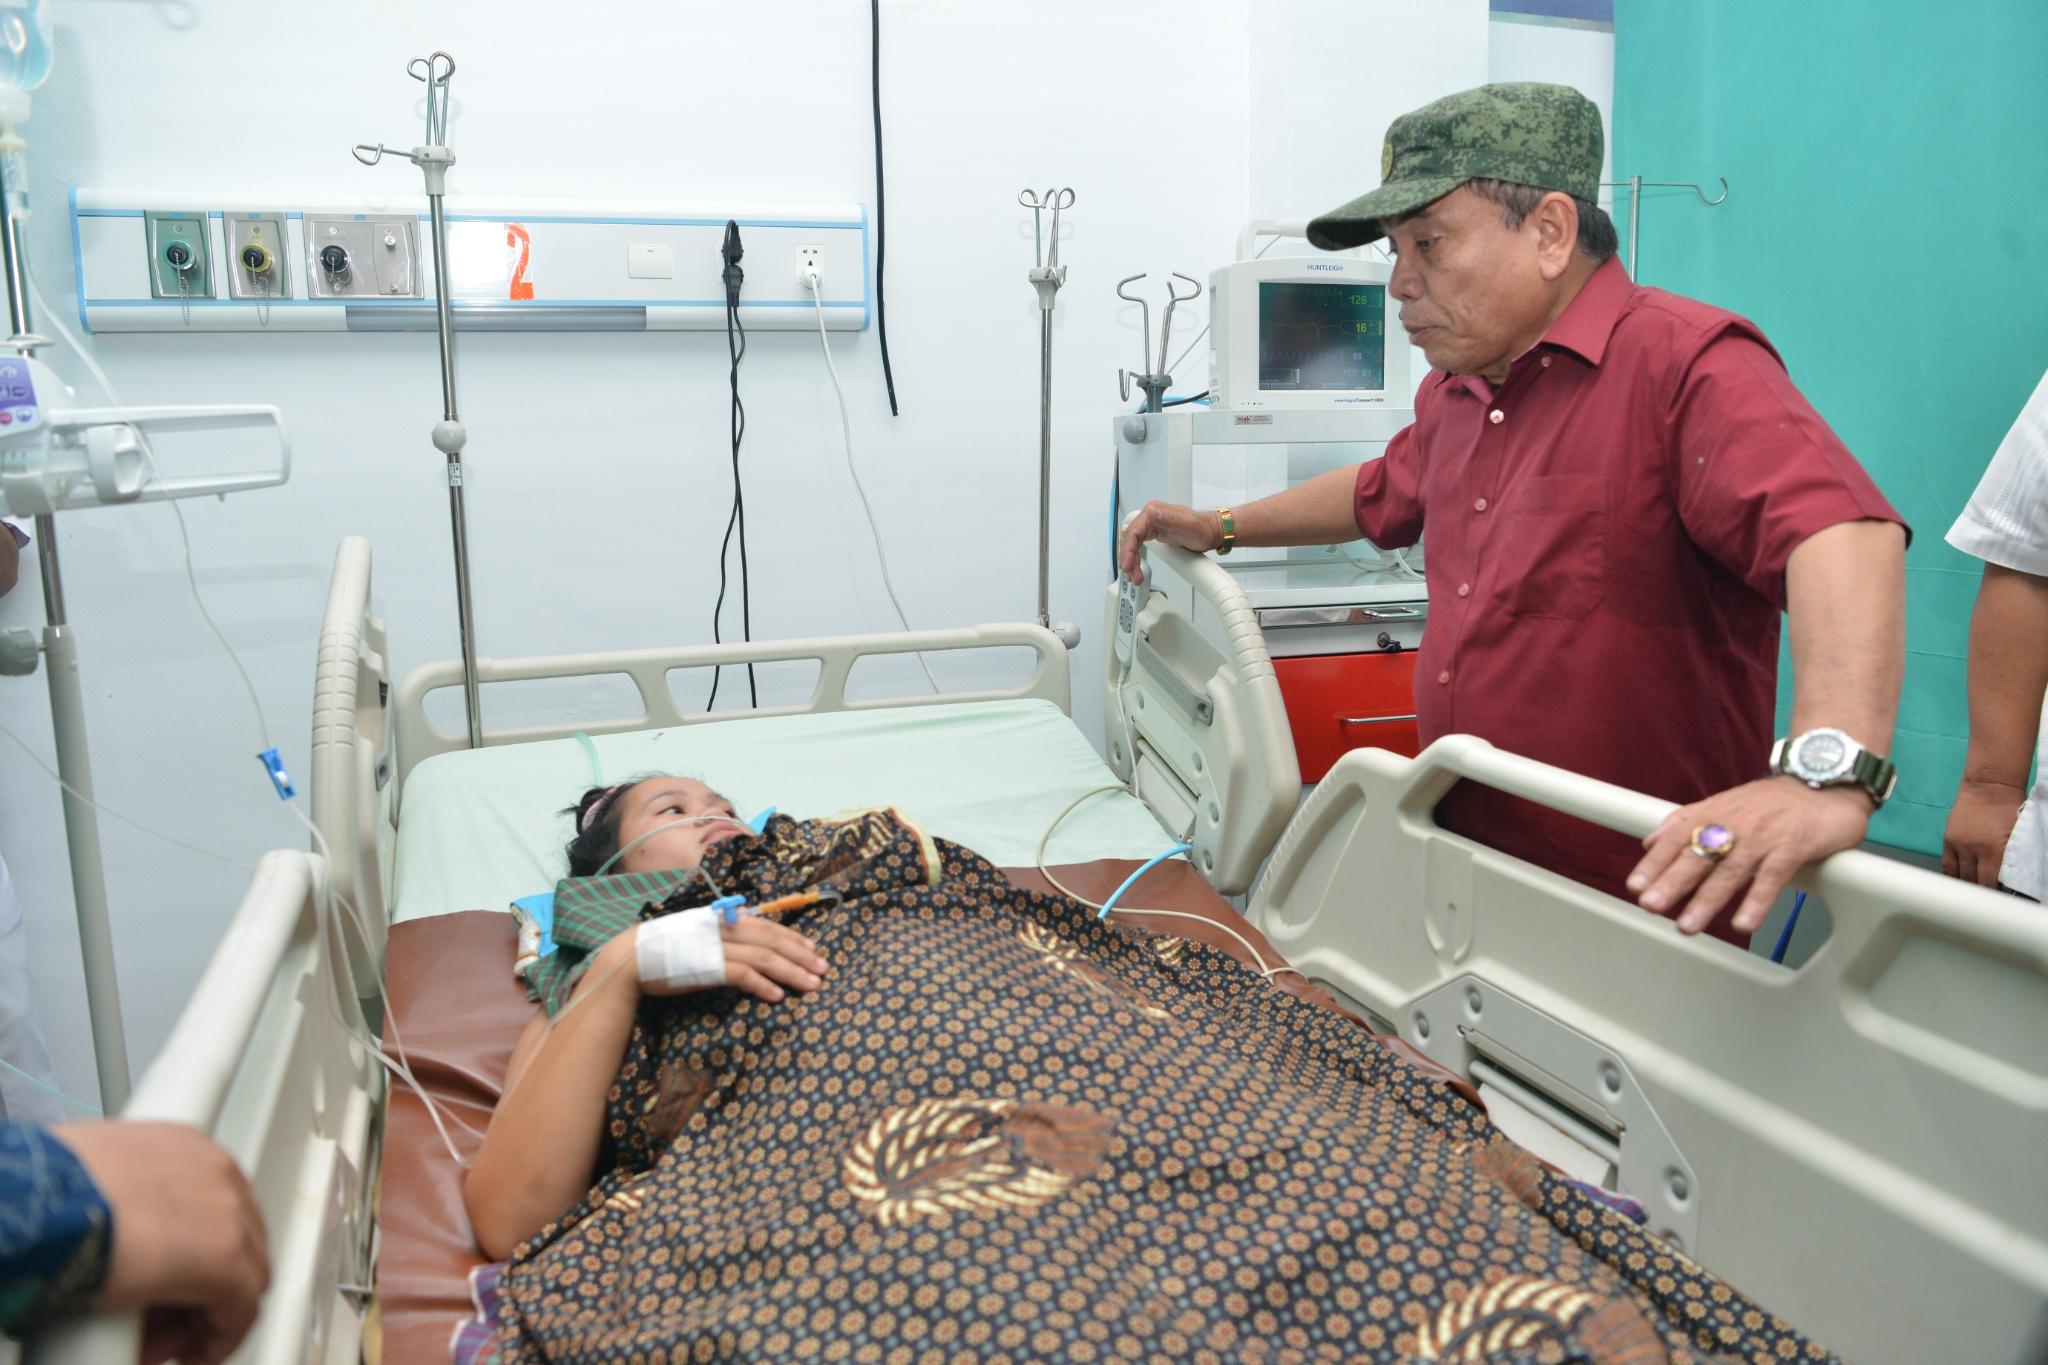 Gubernur Aceh Irwandi Yusuf Tinjau Dua Proyek di Aceh Tamiang